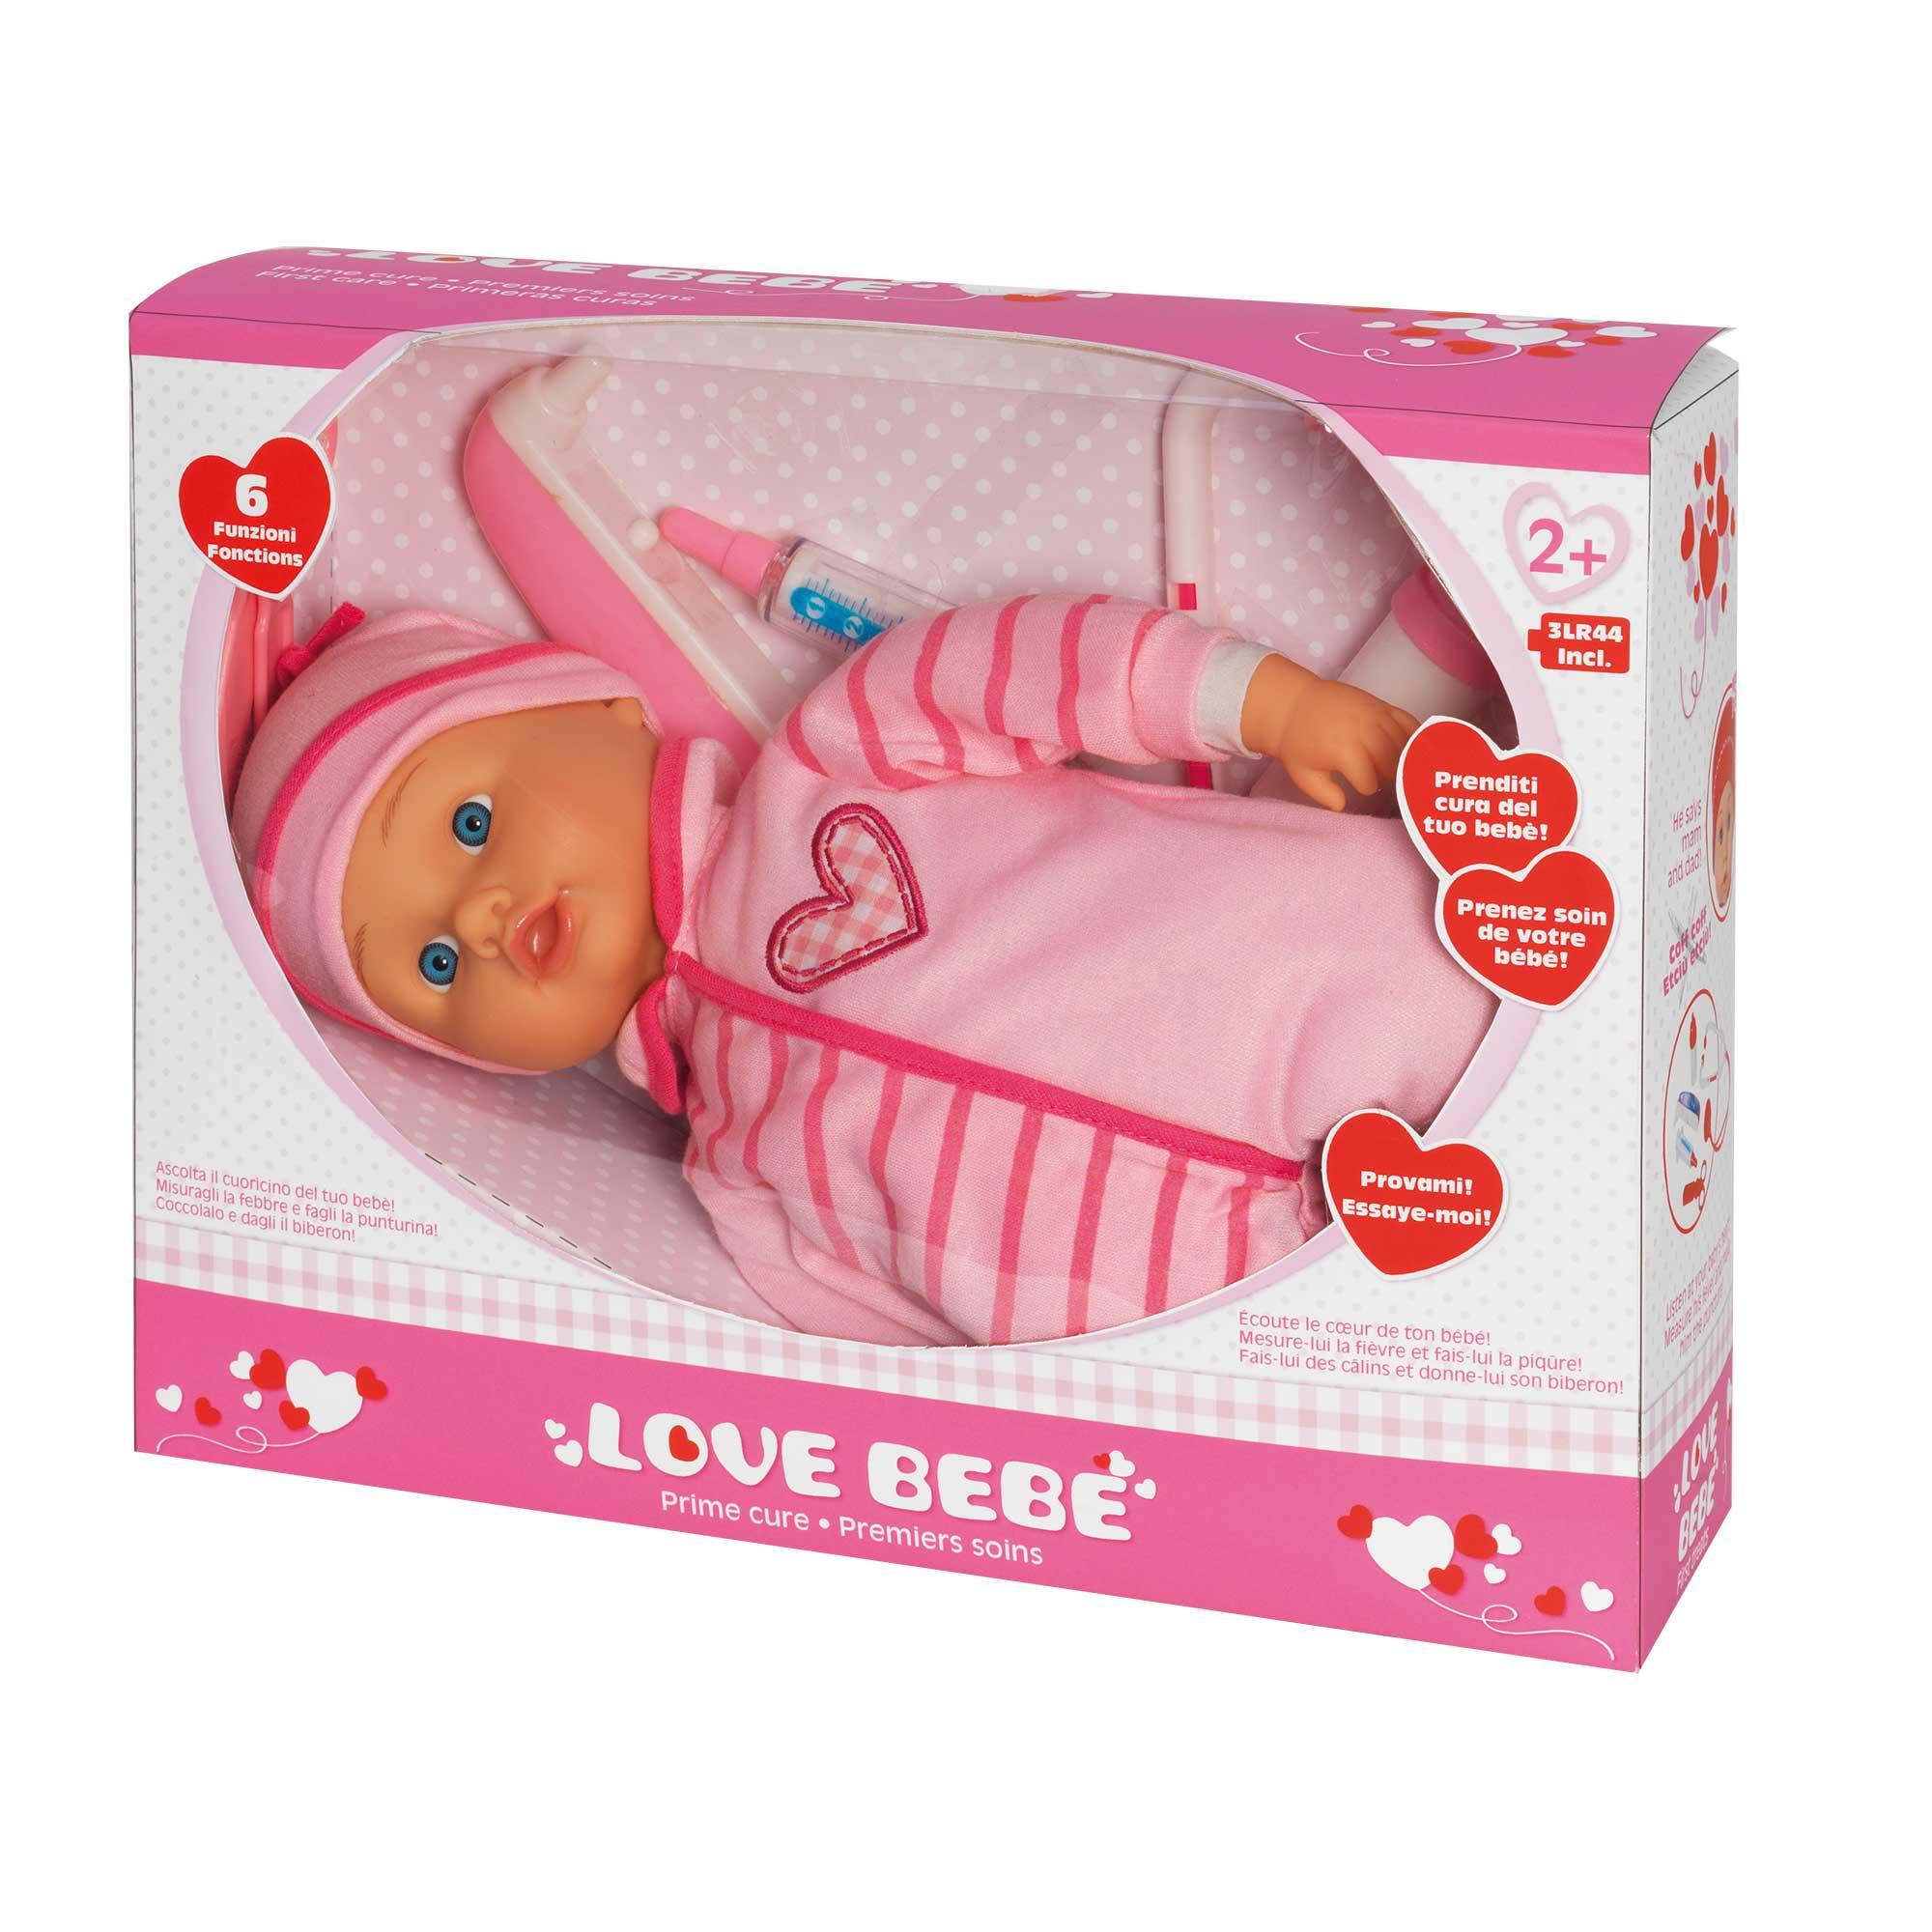 Bebe' prime cure - bambola con set dottore - LOVE BEBÈ